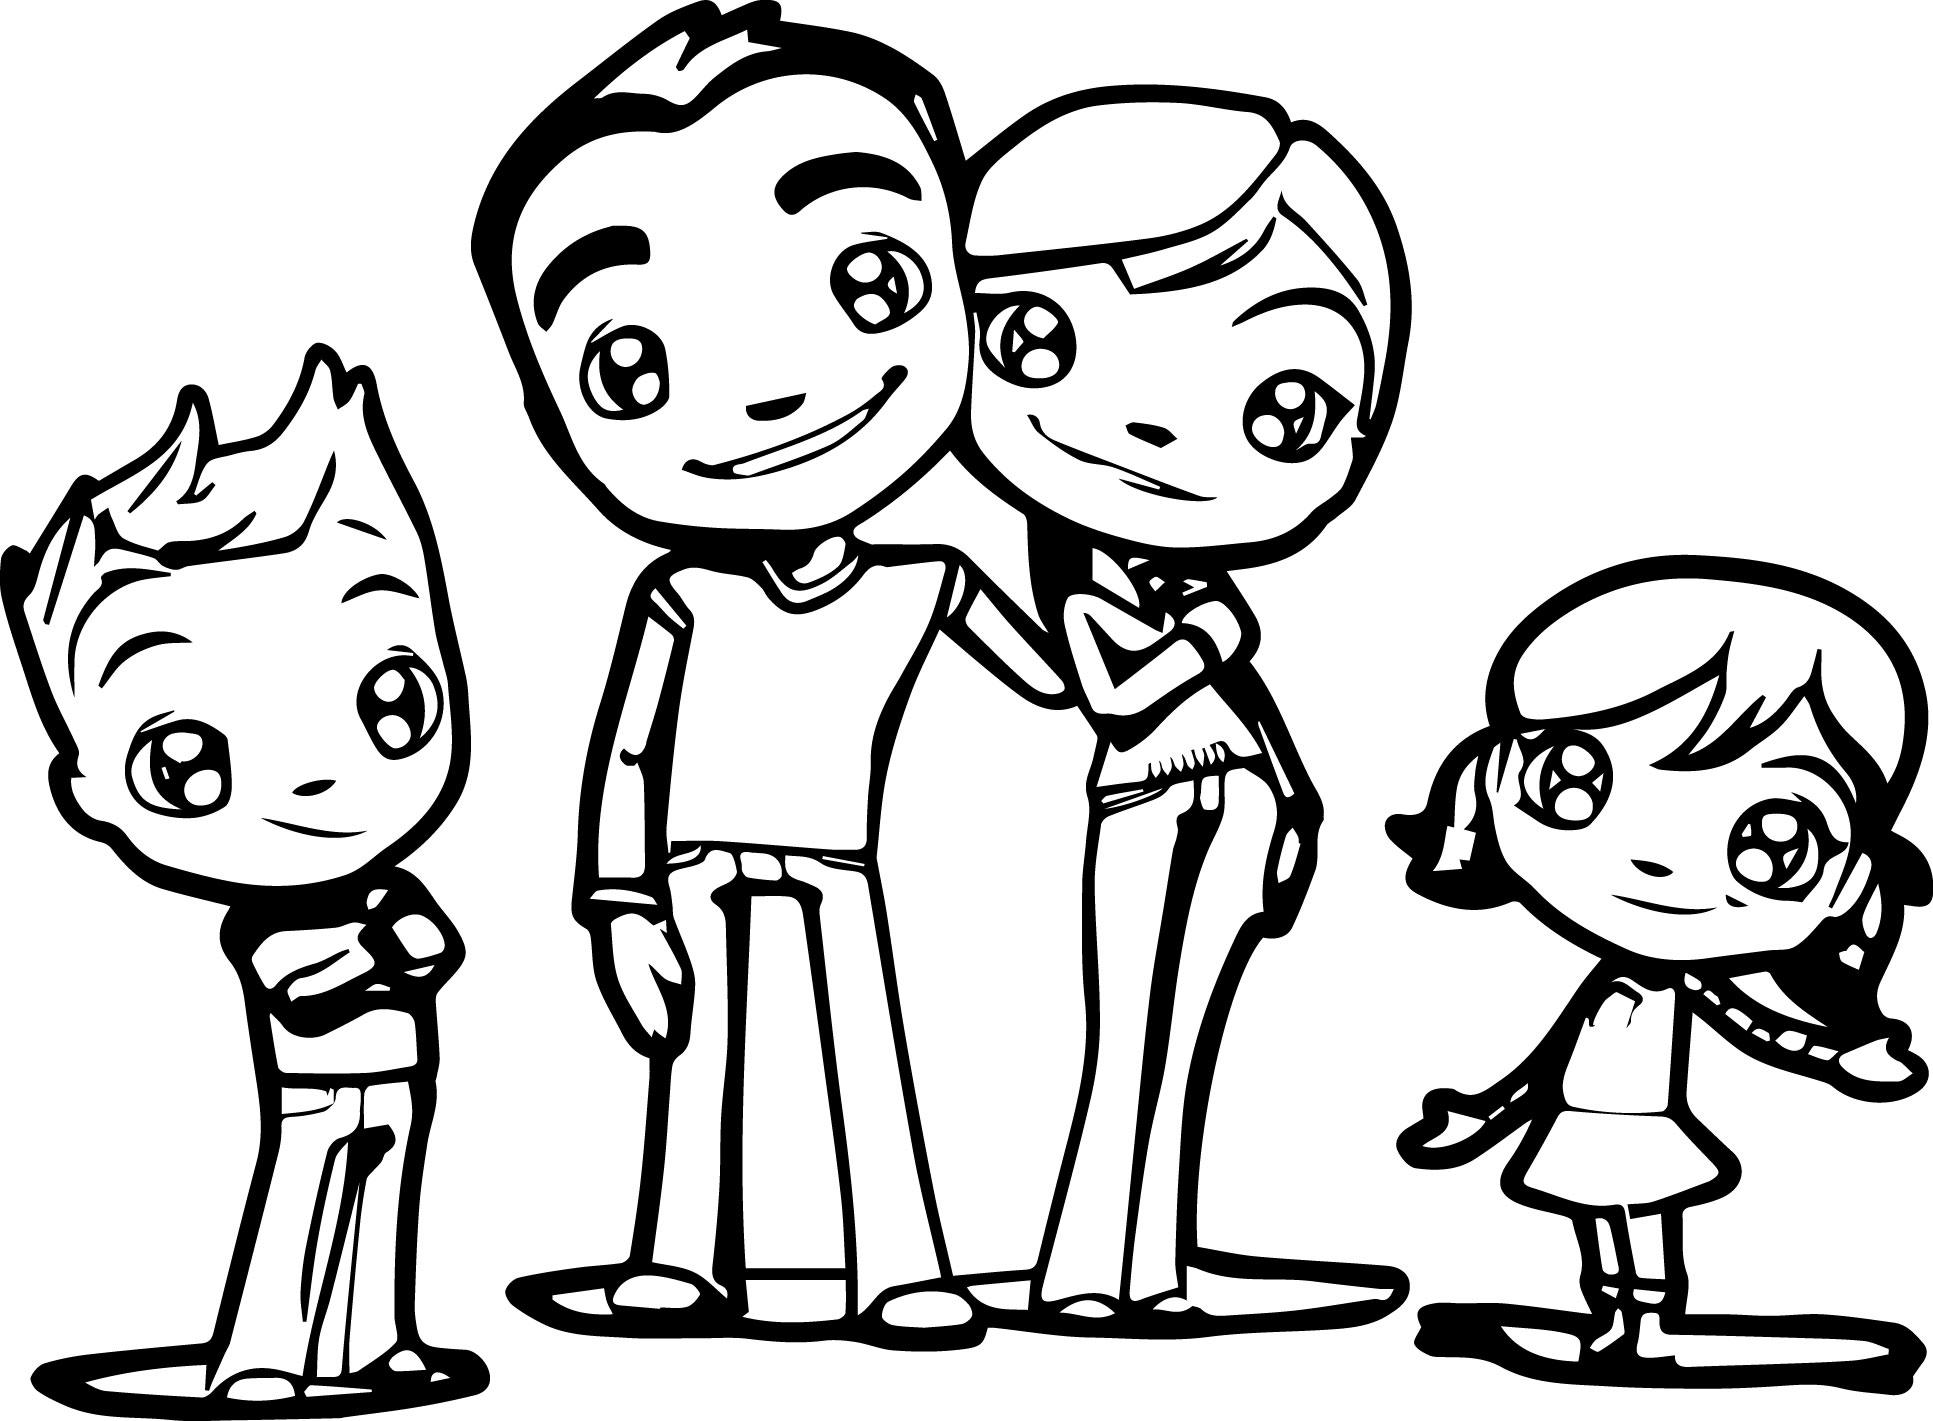 family coloring sheets fun learn free worksheets for kid แบบฝกหดภาษาองกฤษ coloring sheets family